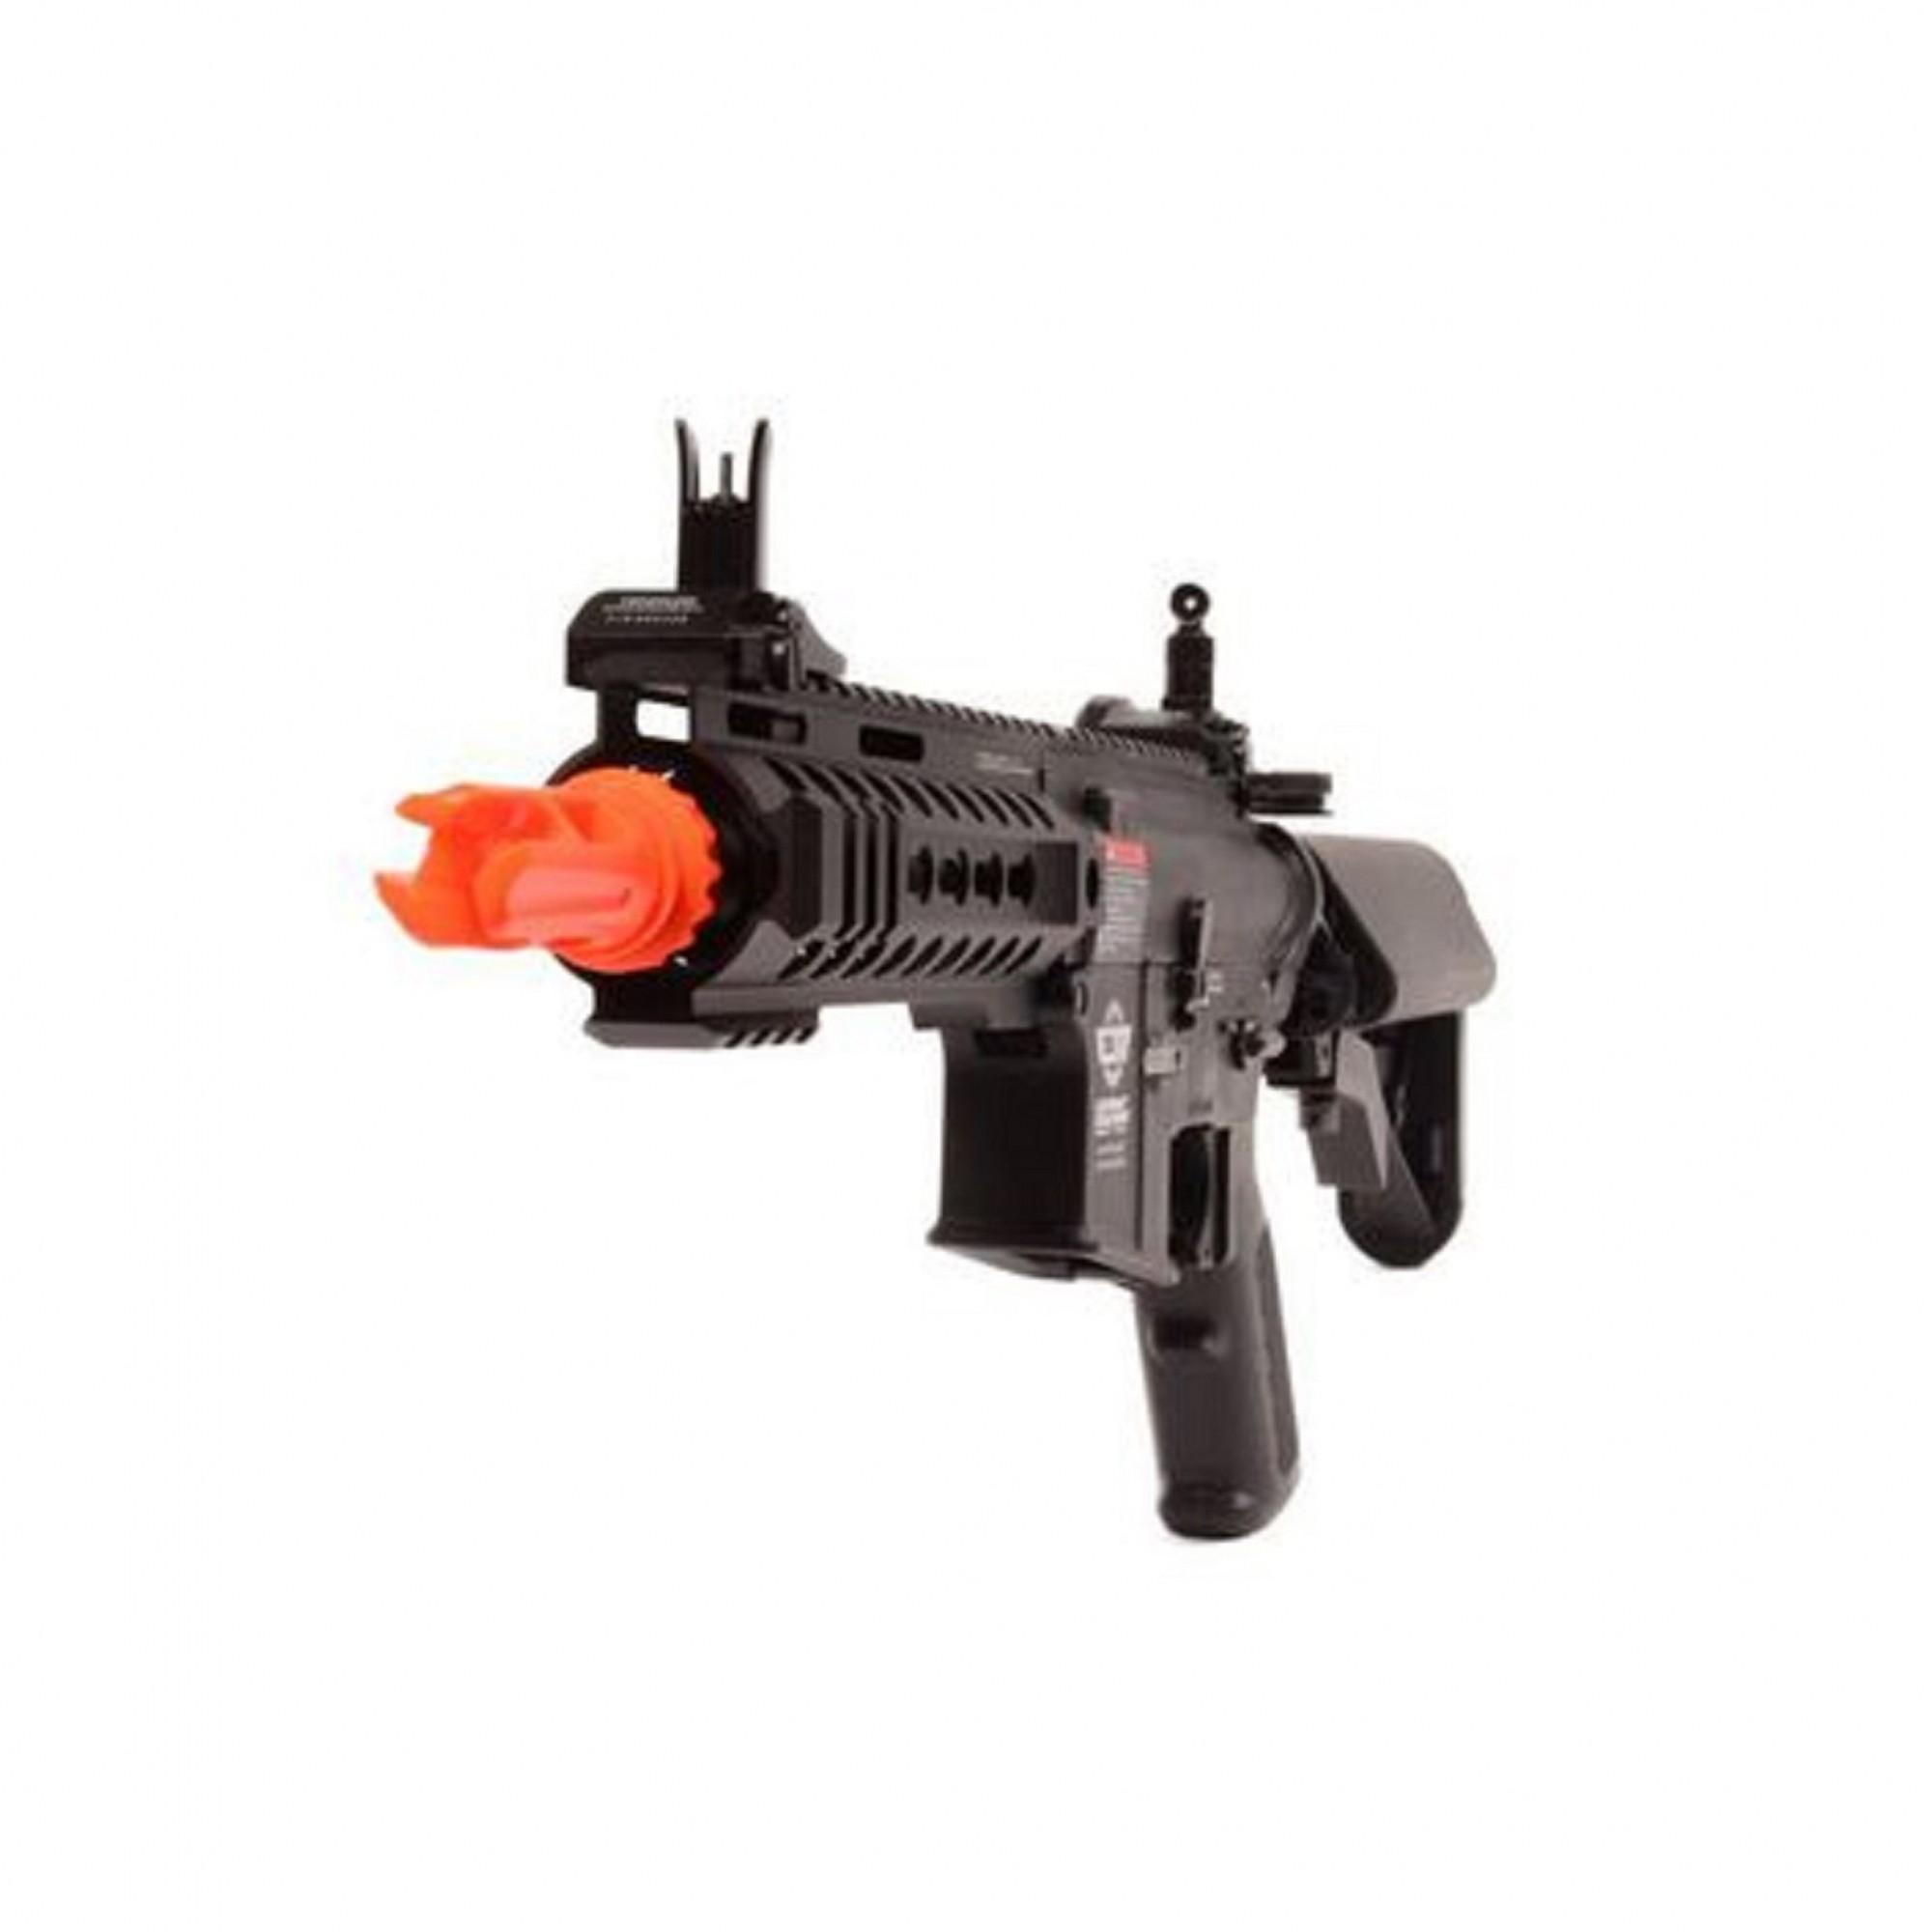 Rifle Airsoft CM16 300 BOT RIS Metal Com Mosfet